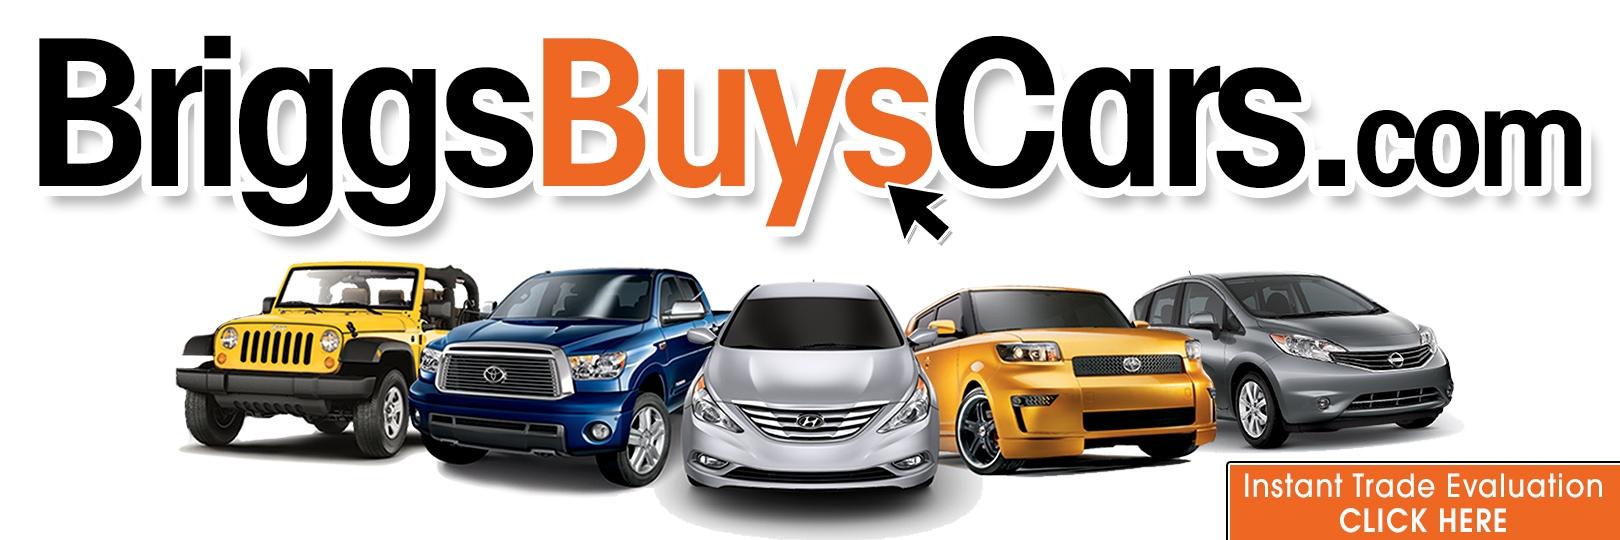 briggs auto group new used car dealer serving manhattan junction city topeka lawrence. Black Bedroom Furniture Sets. Home Design Ideas